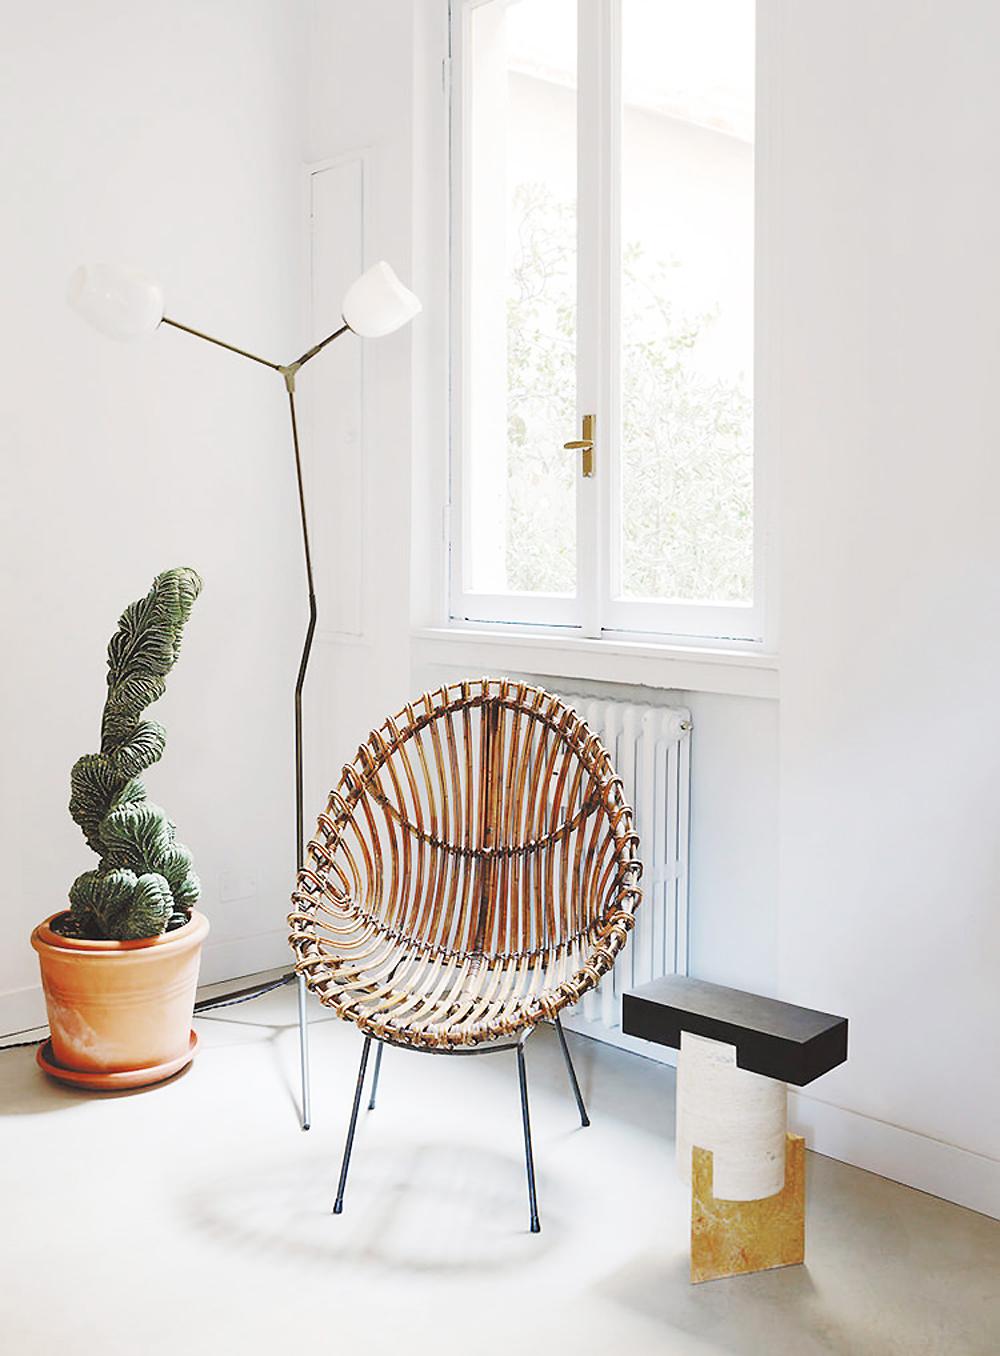 2-nicolas-bellavance-lecompte-milan-apartment-interiors-home-apartment-sunday-sanctuary-oracle-fox.jpg